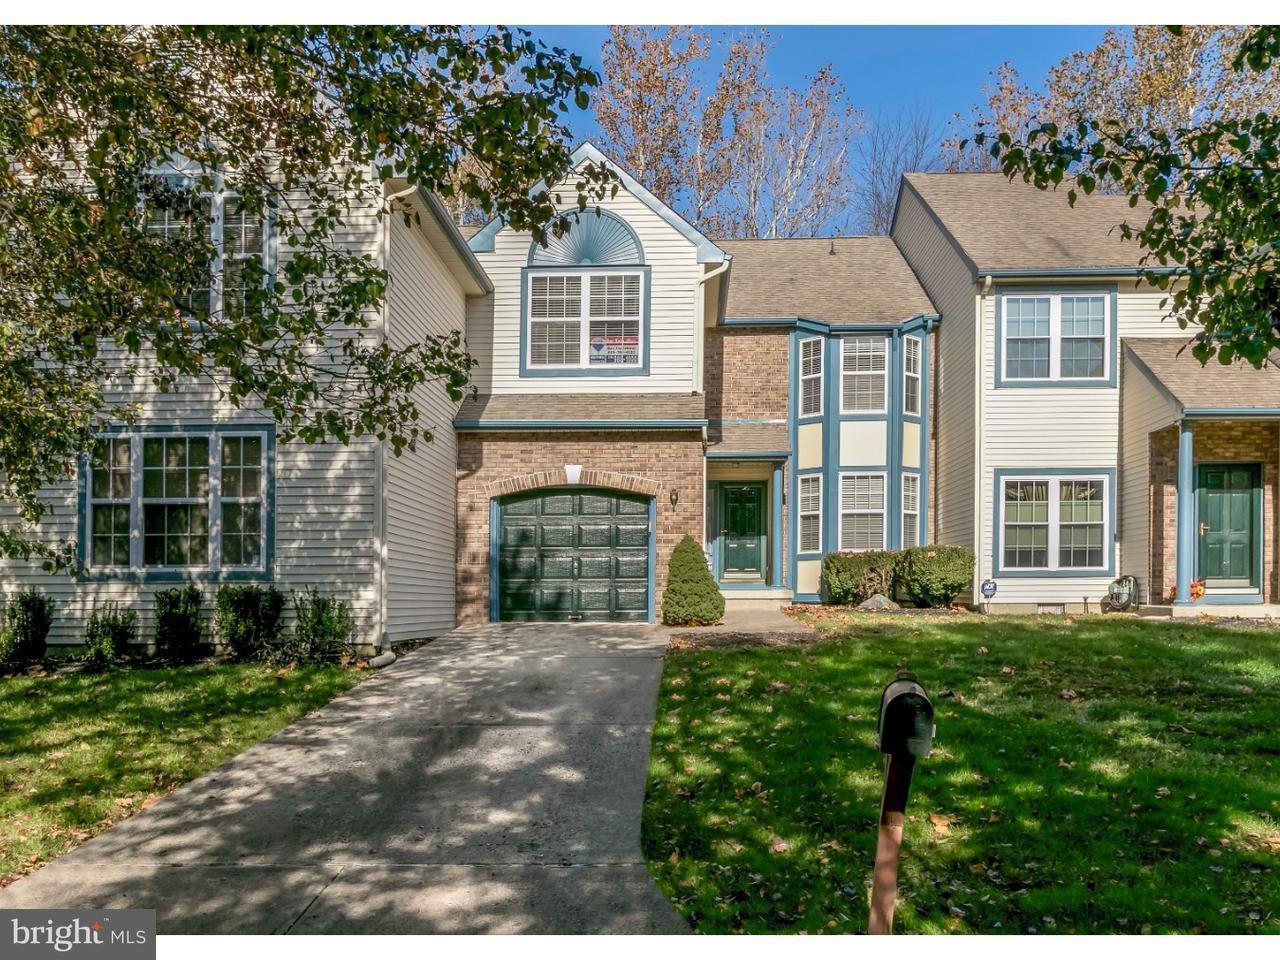 Condominium for Rent at 20 SUMMERHILL Lane Medford, New Jersey 08055 United States